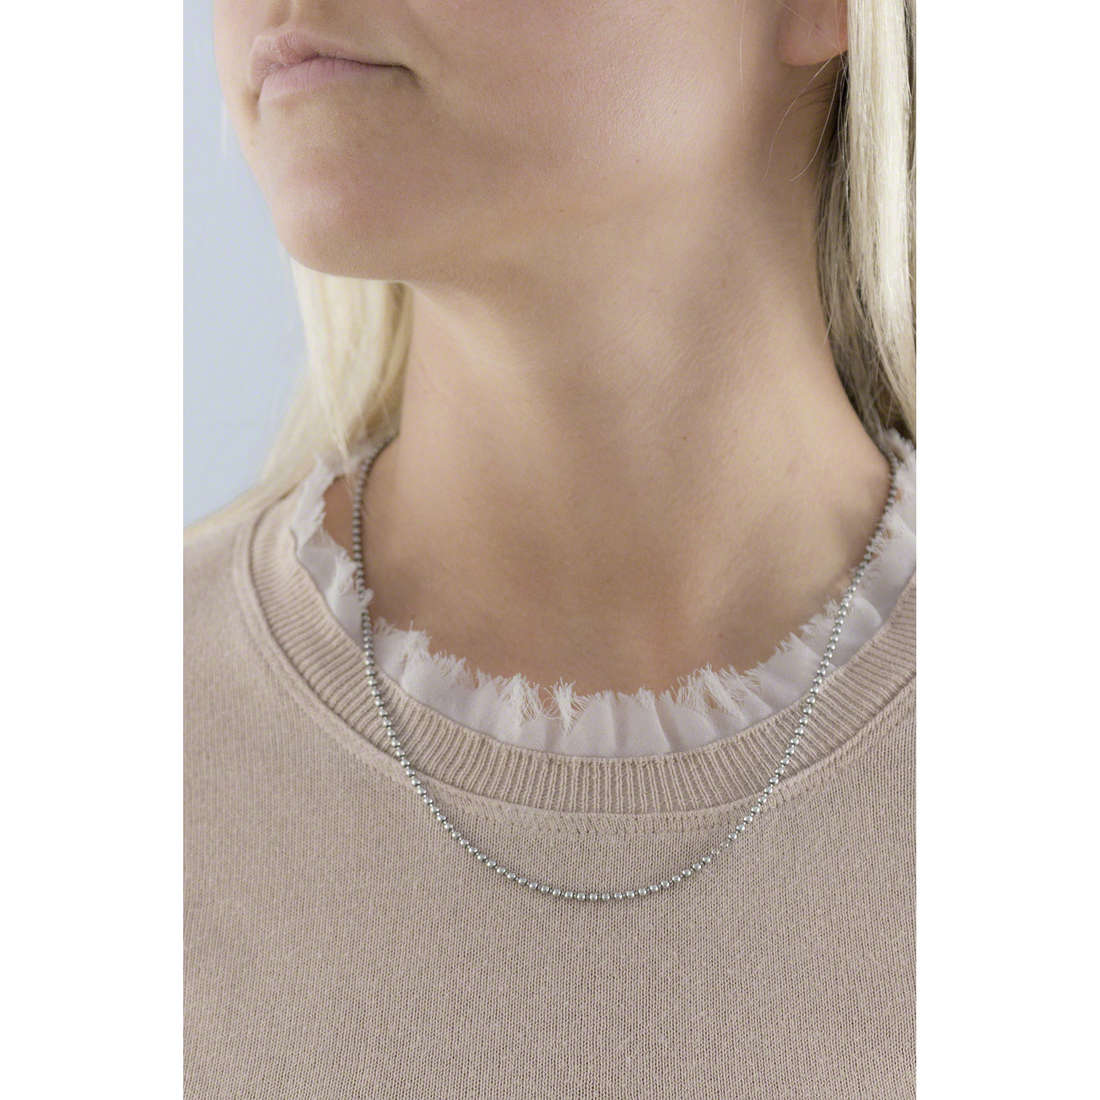 GioiaPura colliers femme GPSRSCL0021-50-CF indosso